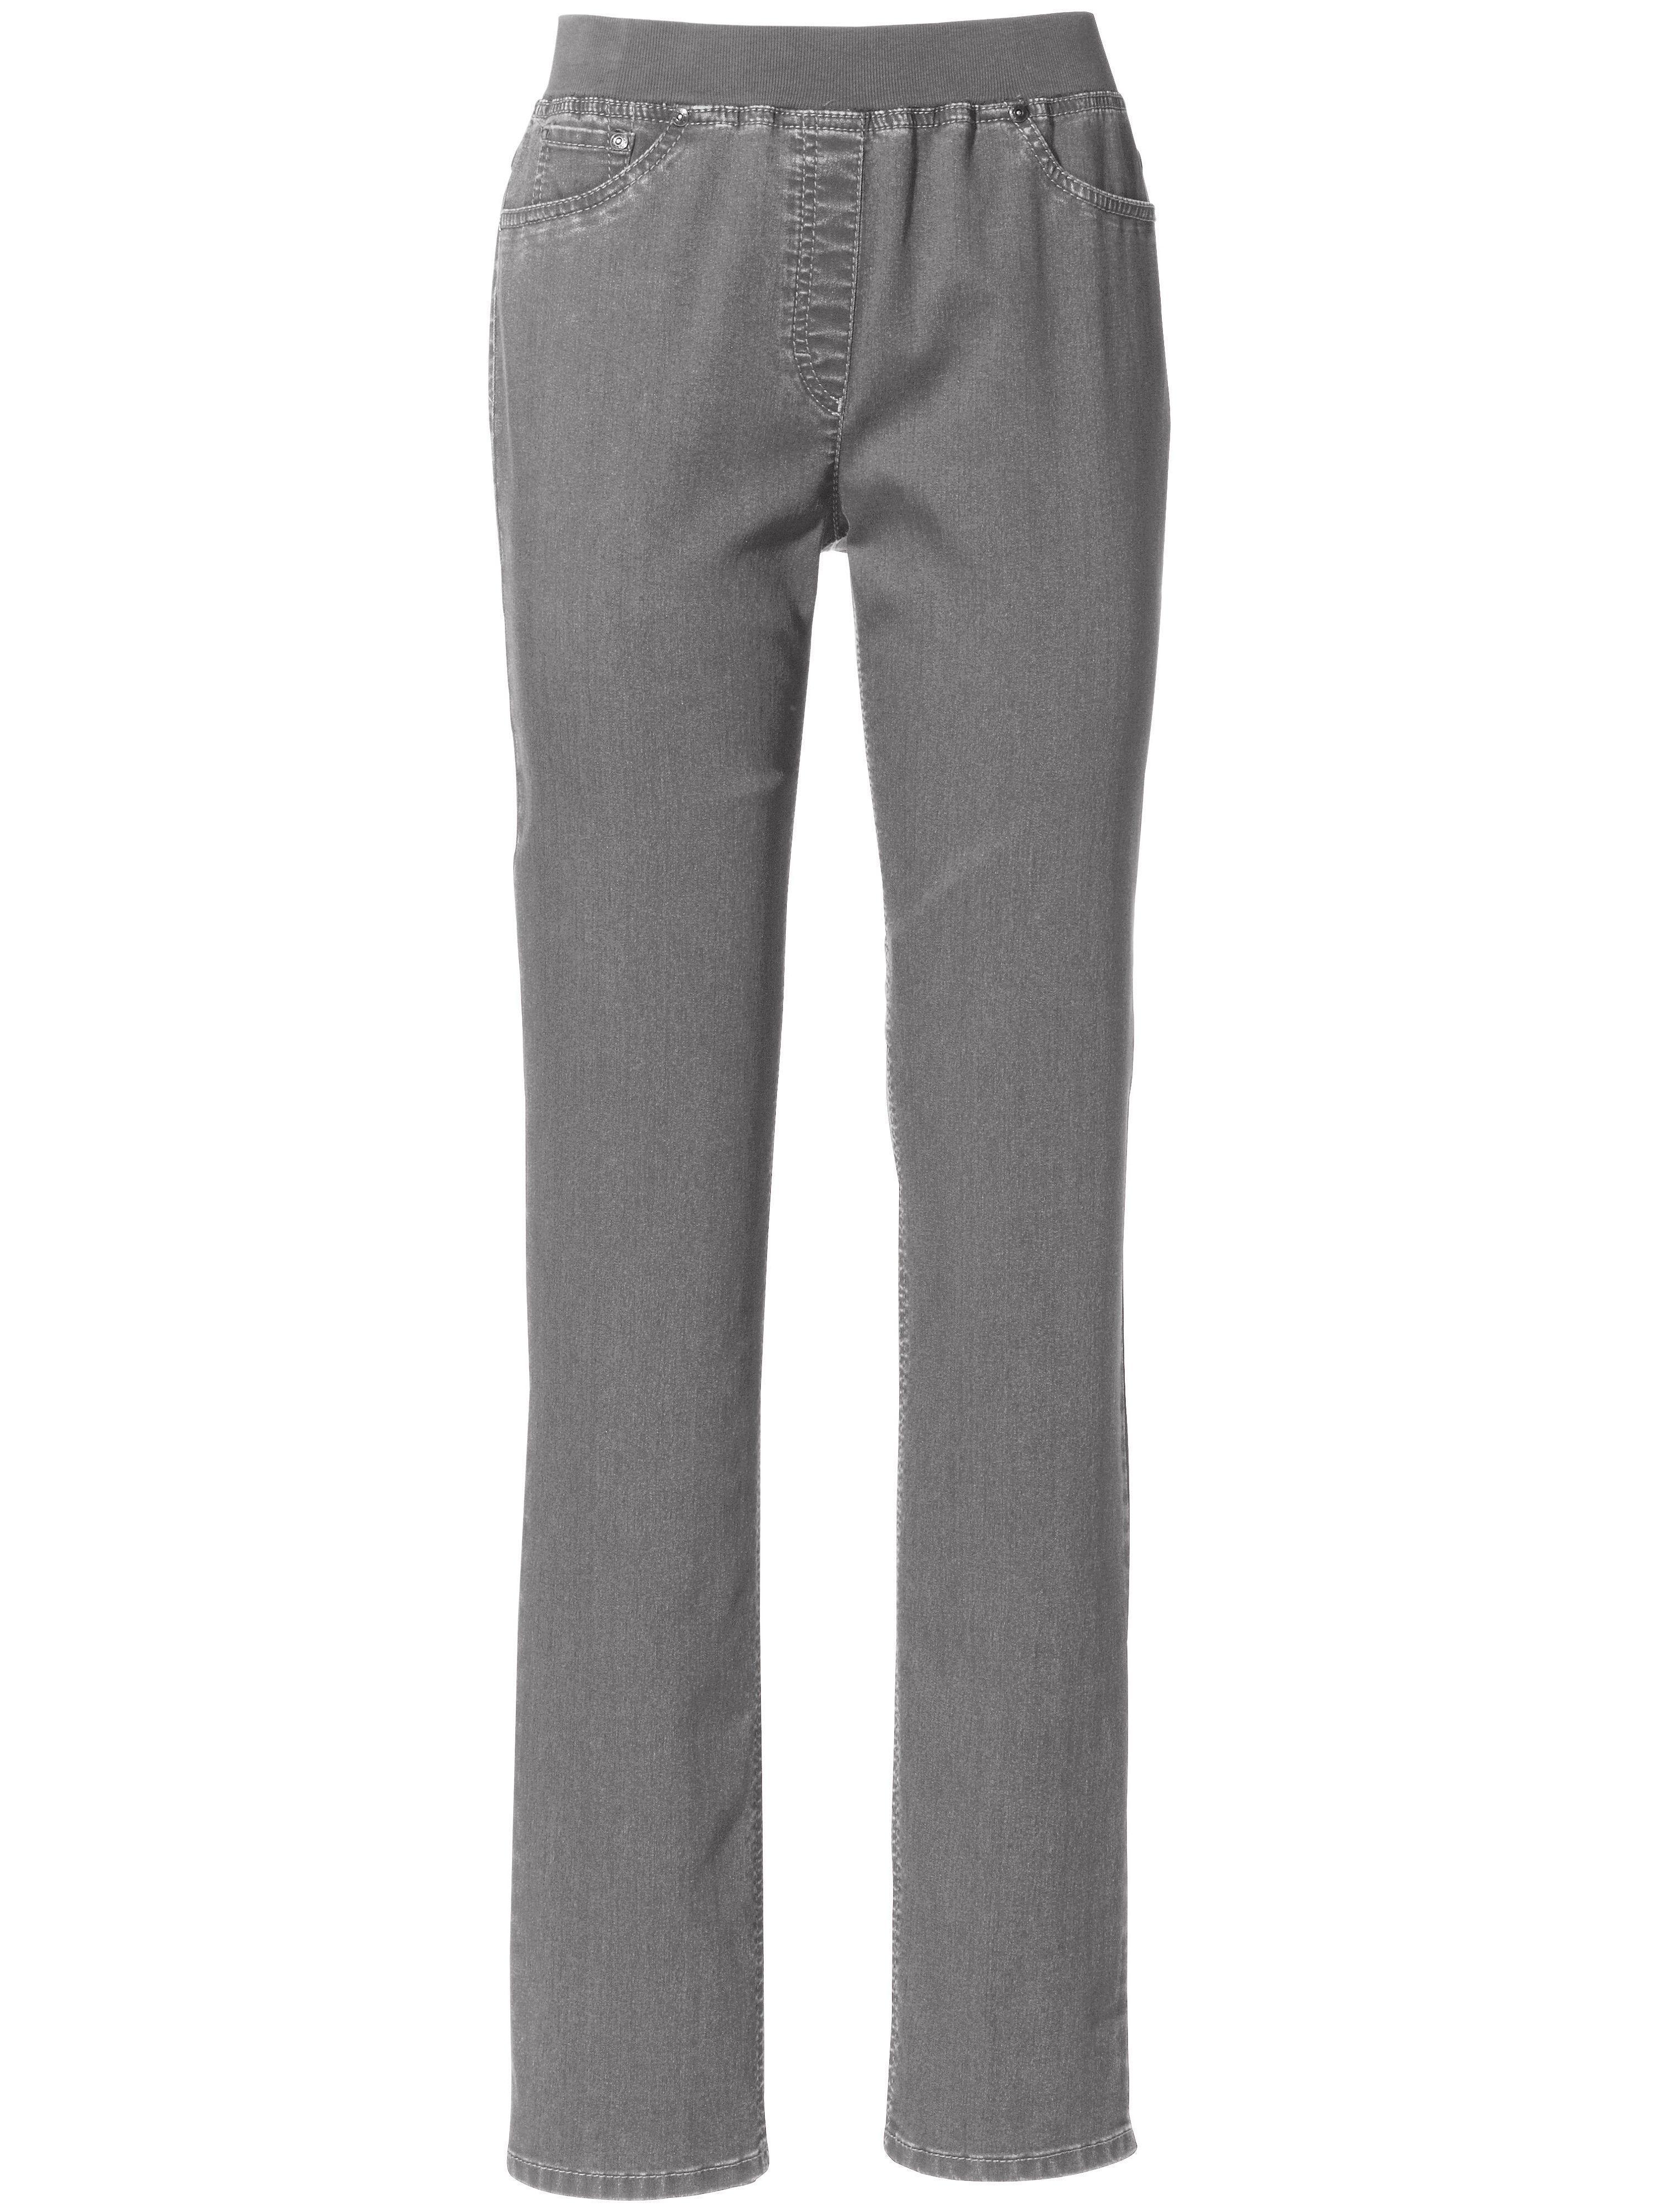 ProForm Slim-Jeans, model Pamina Van Raphaela by Brax grijs